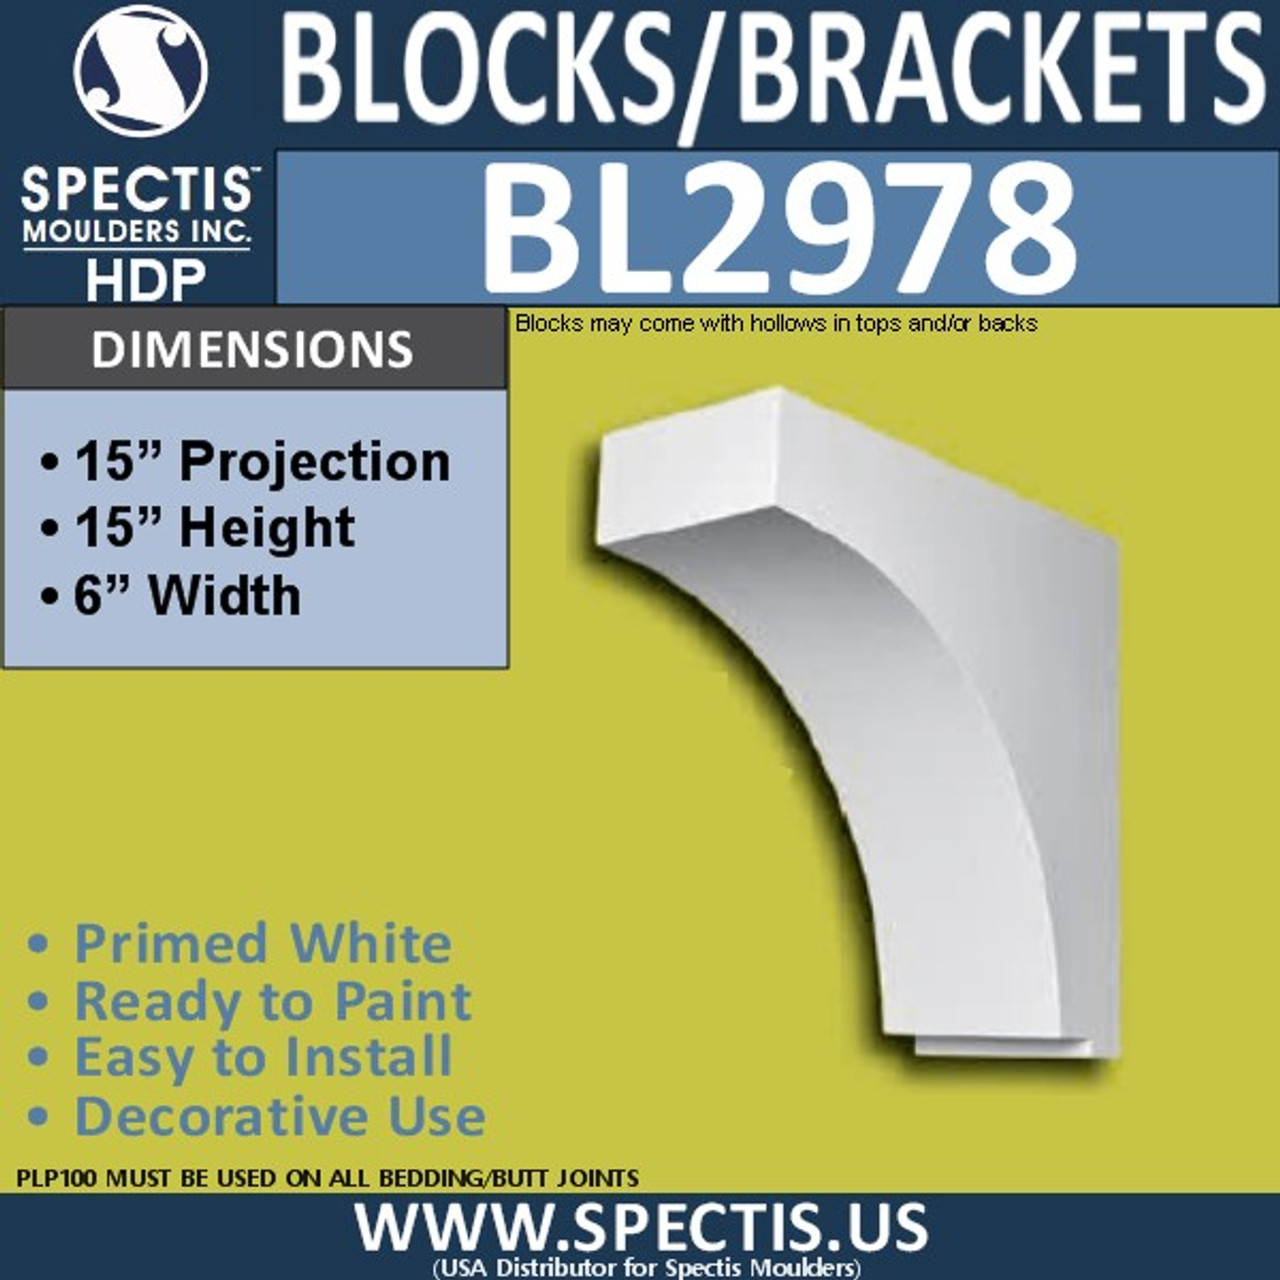 "BL2978 Eave Block or Bracket 6""W x 15""H x 15"" P"